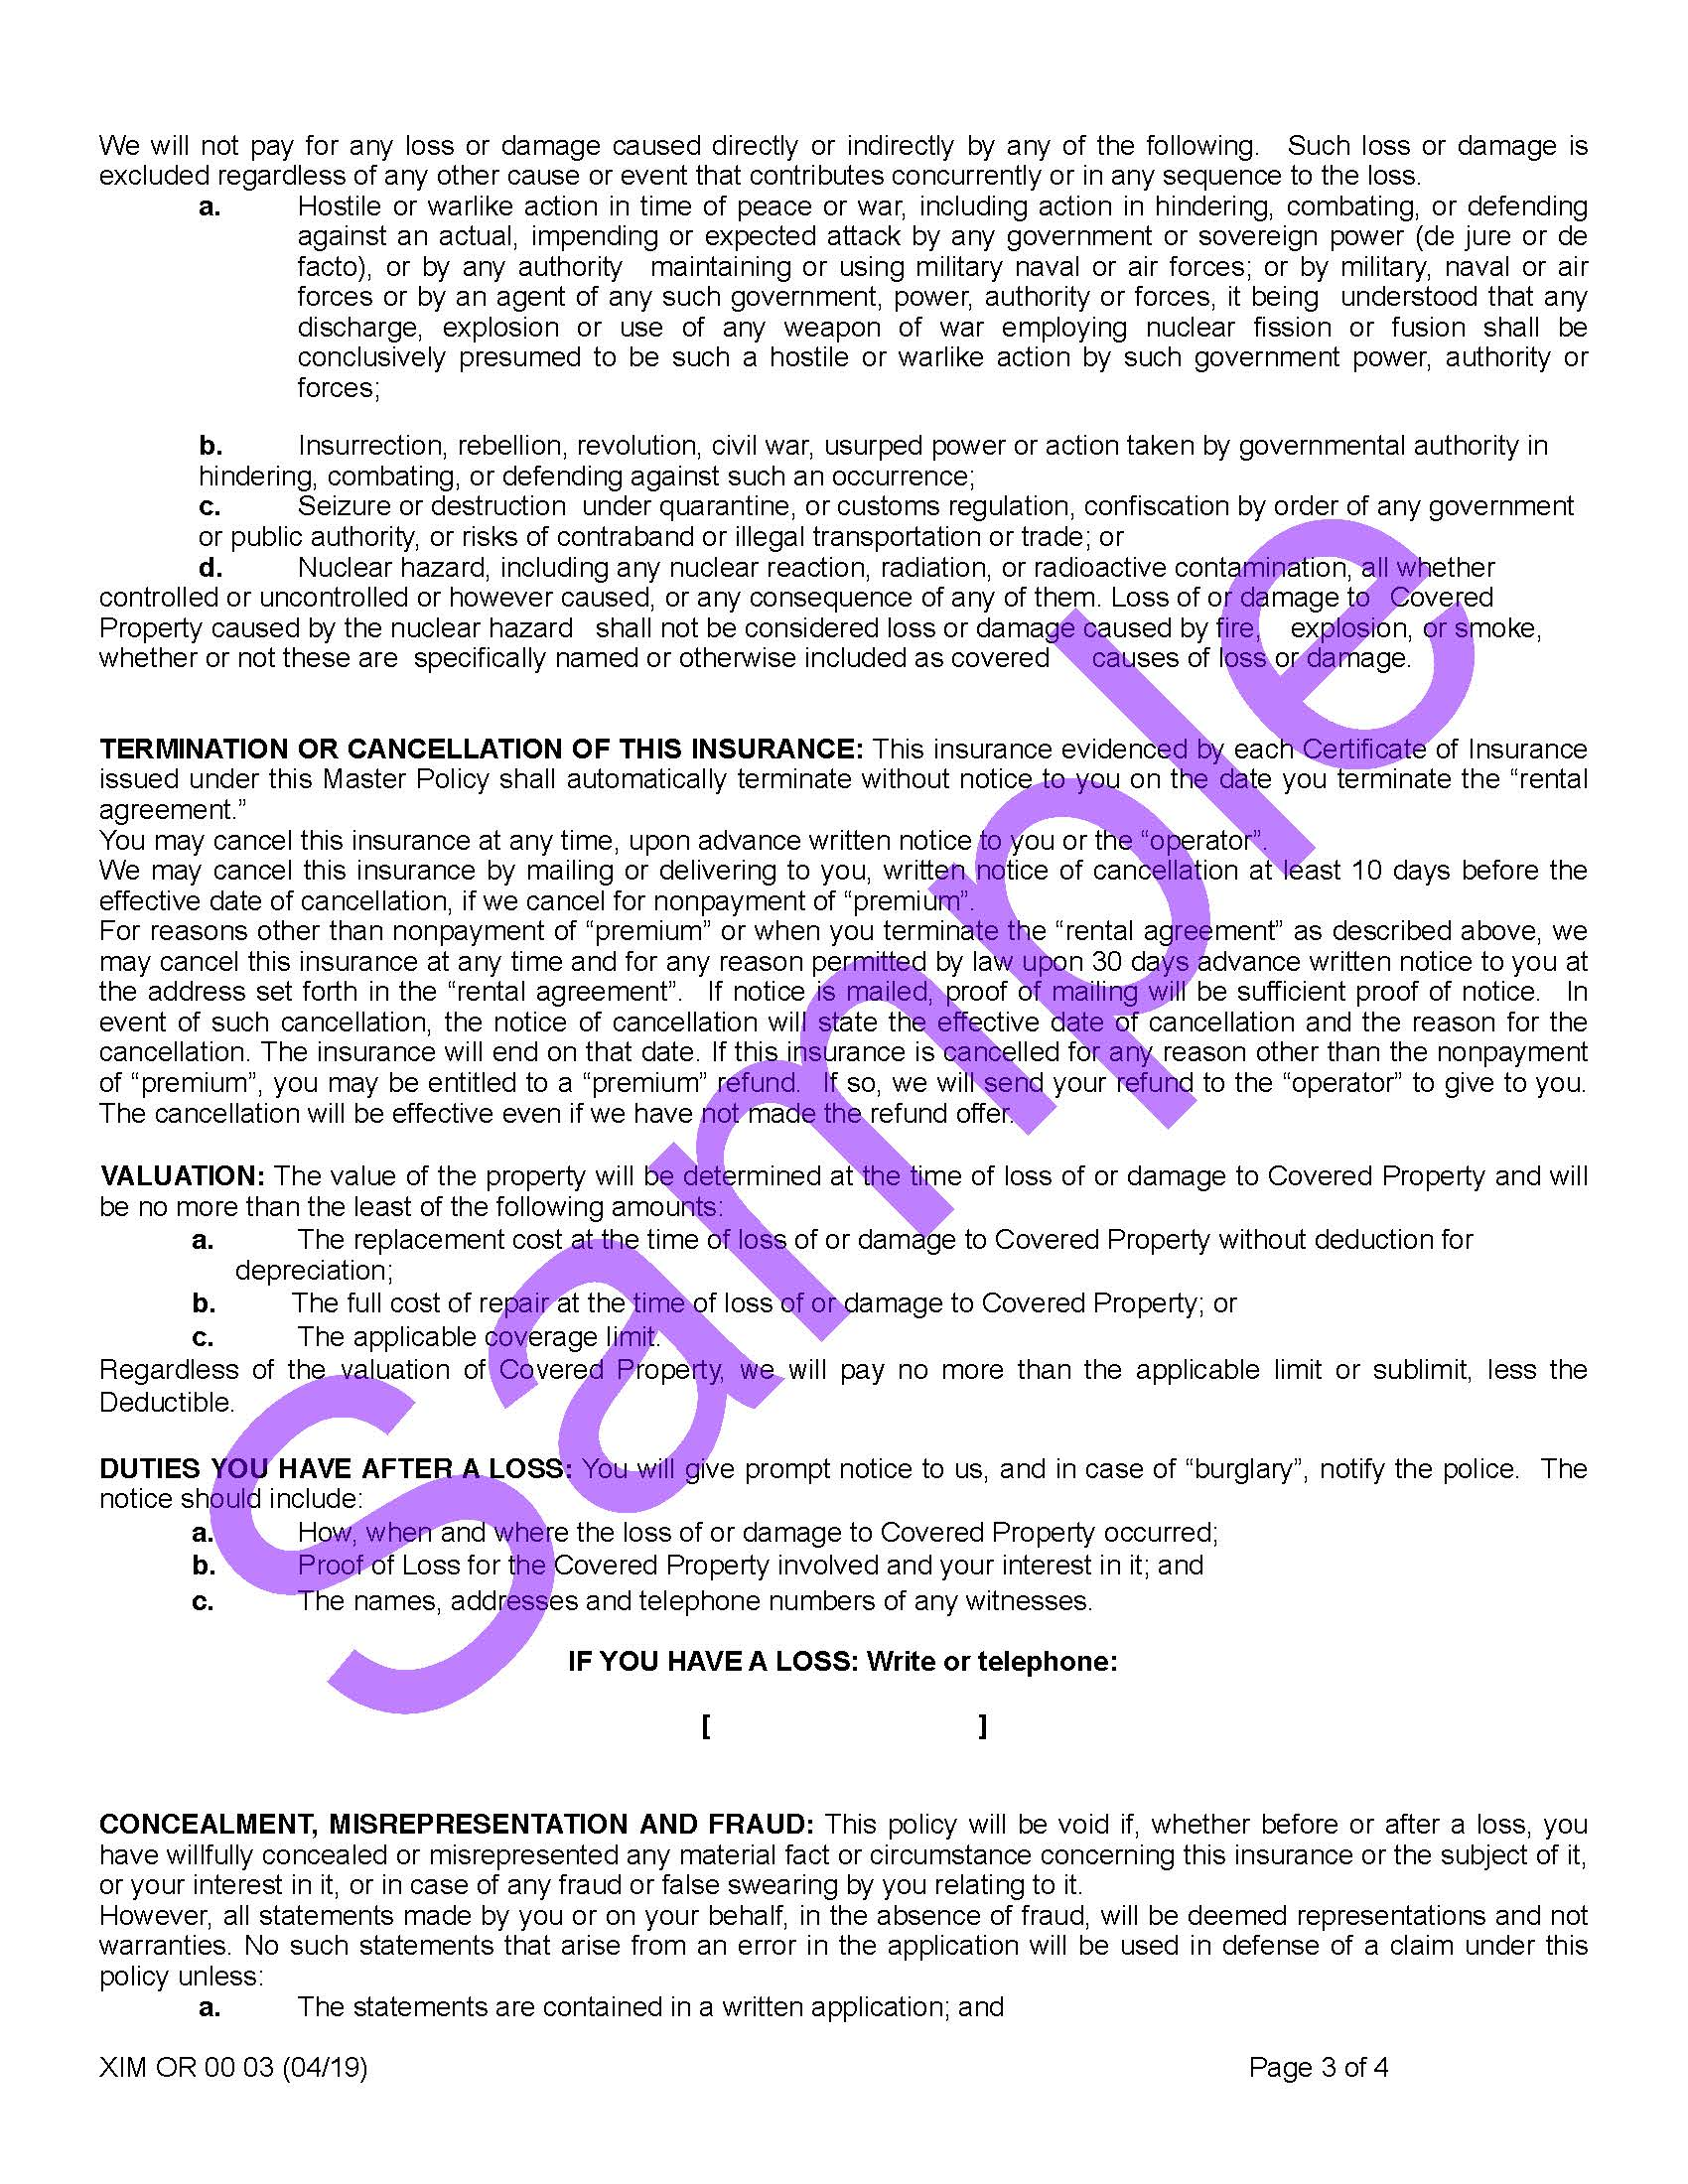 XIM OR 00 03 04 19 Oregon Certificate of InsuranceSample_Page_3.jpg